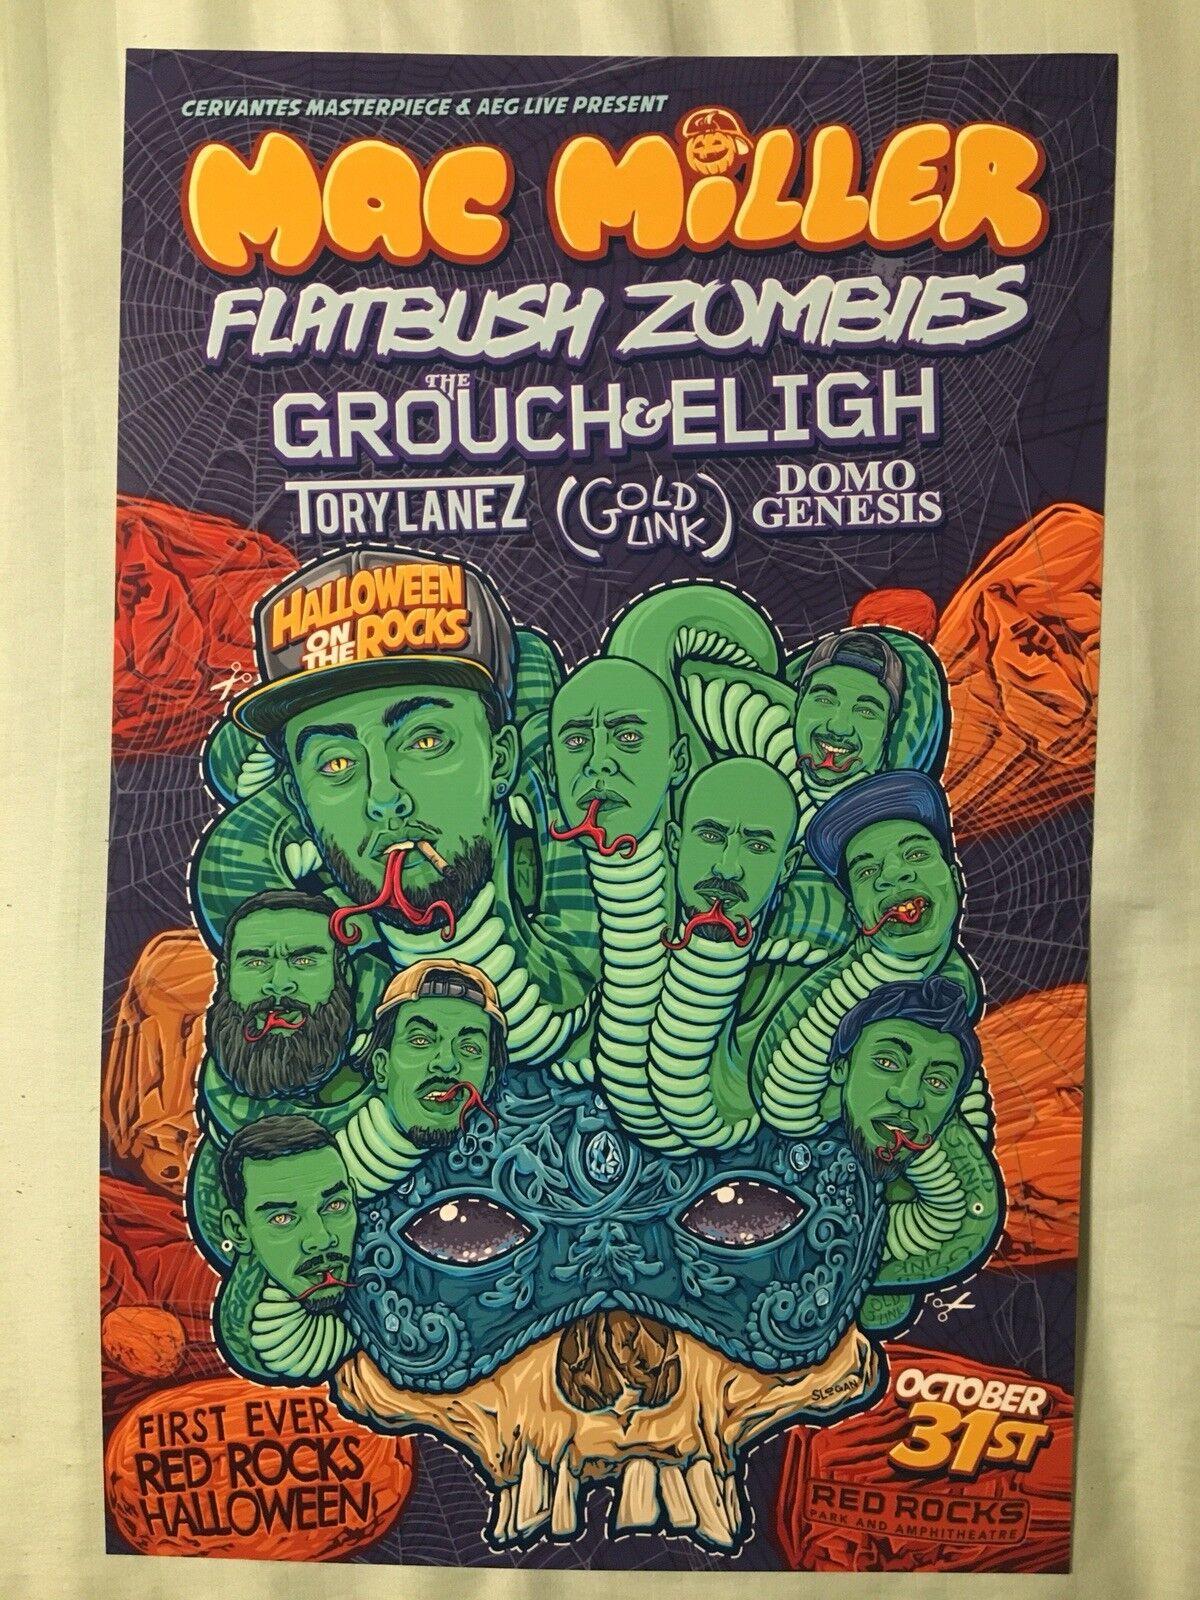 Mac miller flatbush zombies 11x17 tour music poster